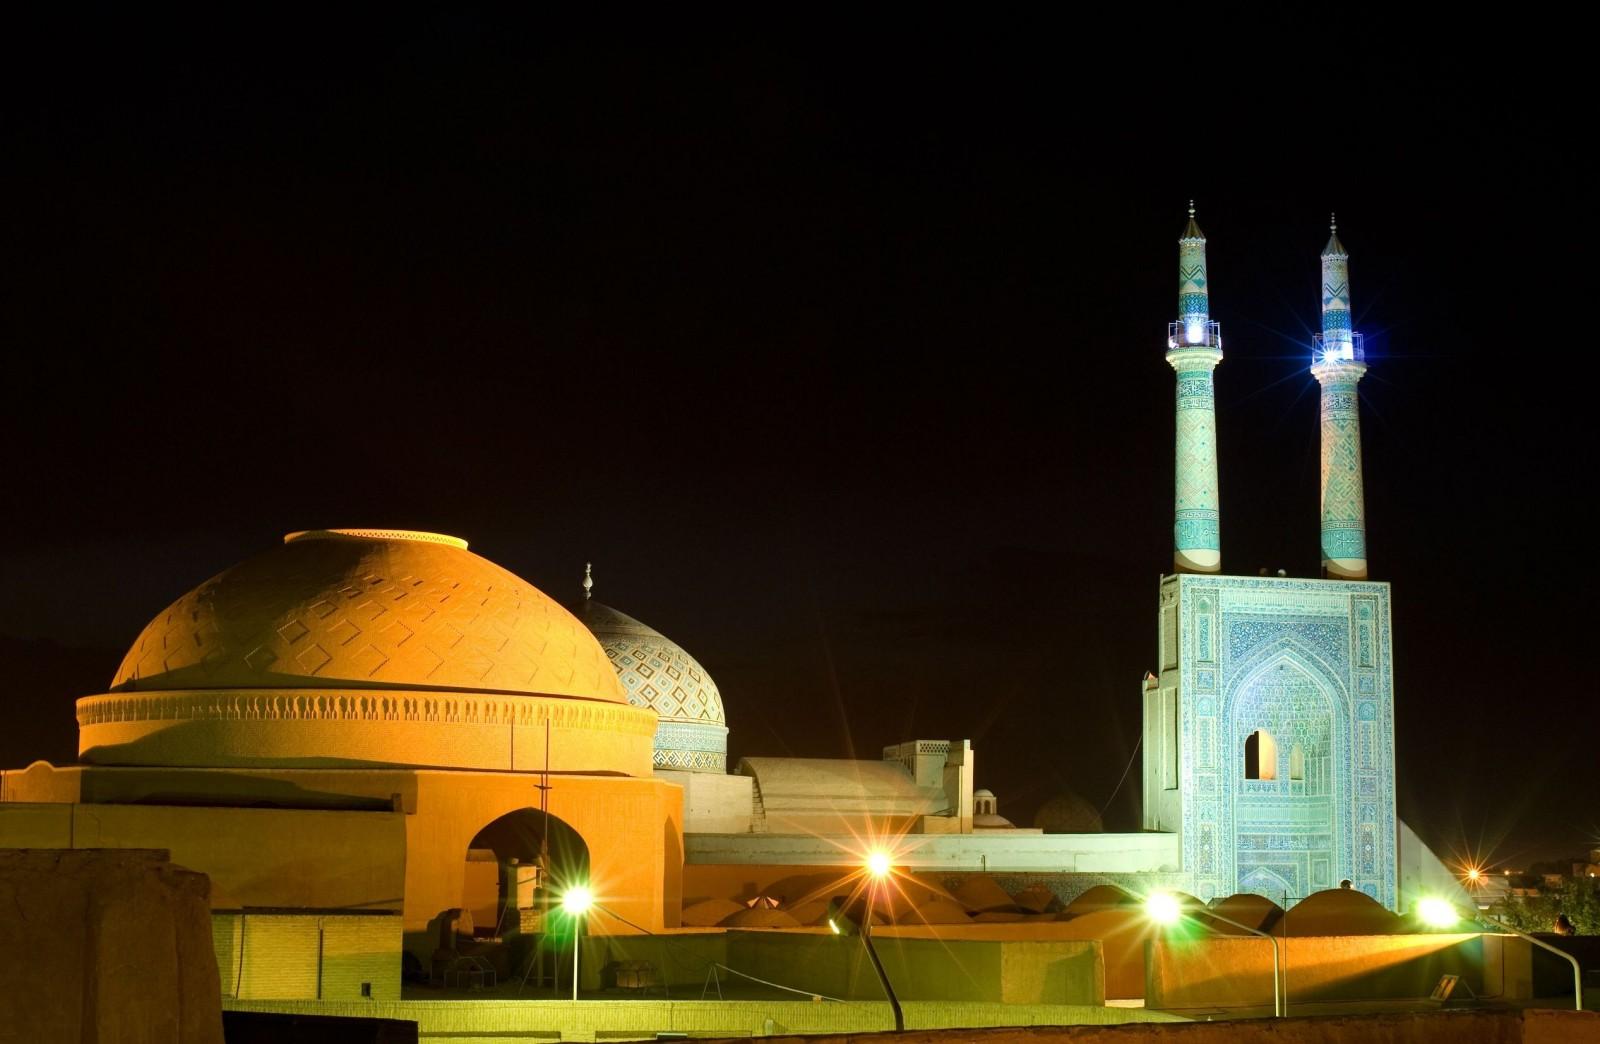 mosque-in-night-lights-yazd-iran-x-jpg-×-pixels-wallpaper-wp6004983